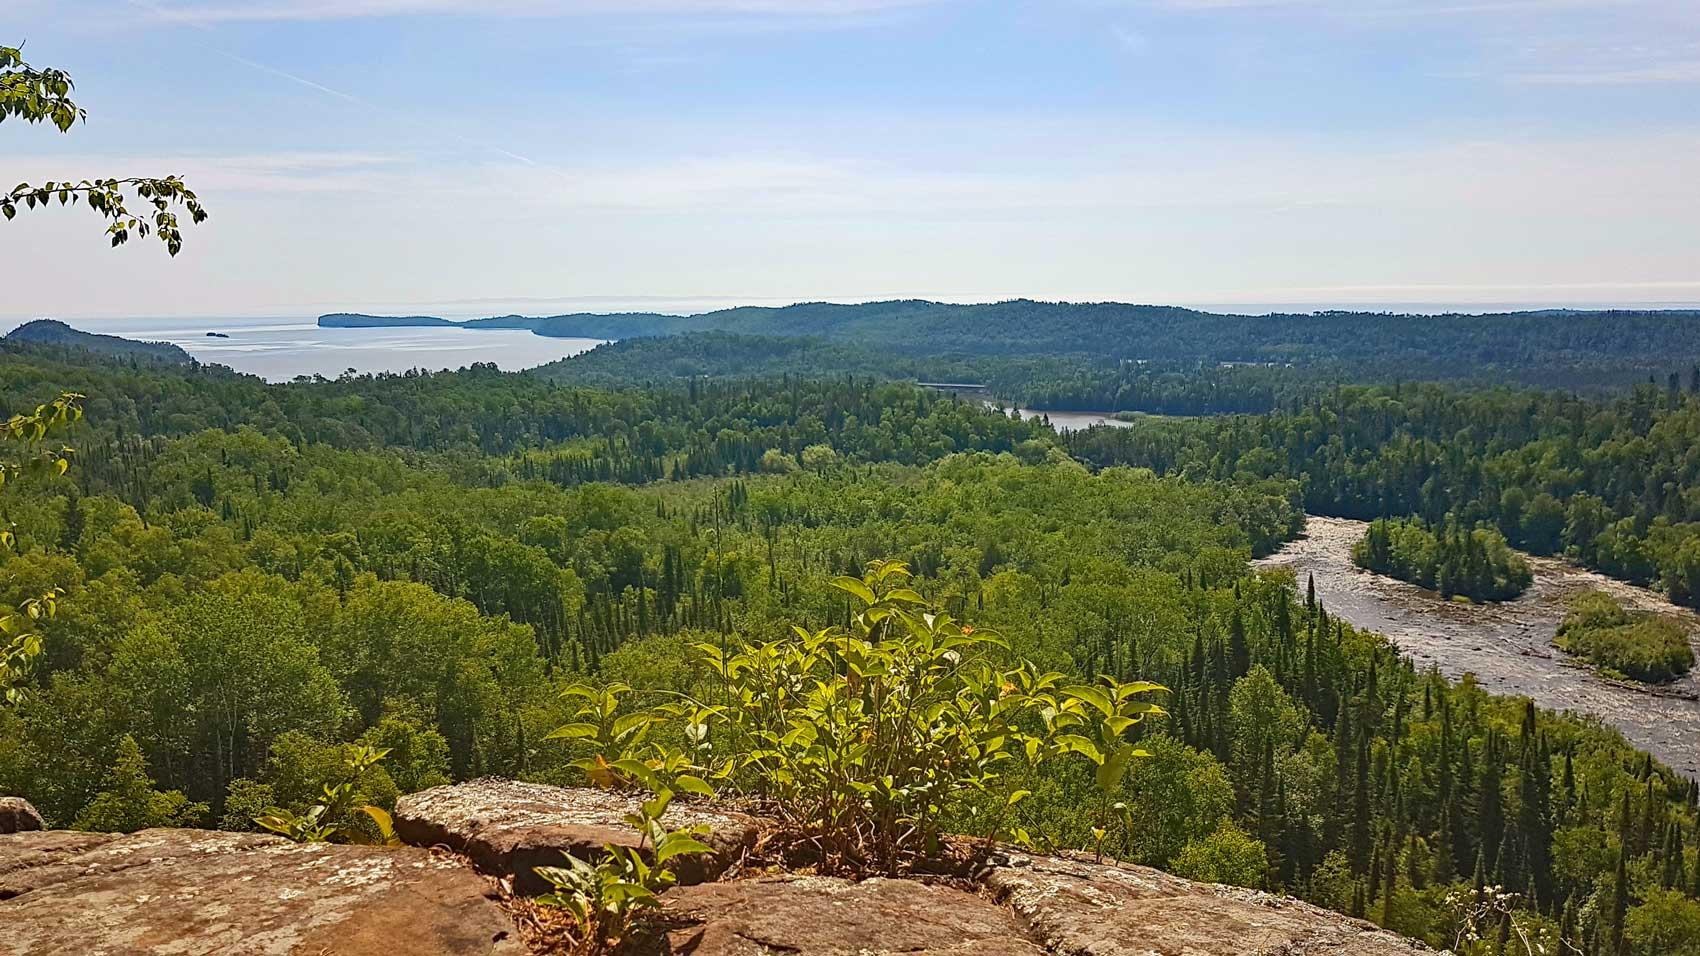 Hiking trails near Lake Superior, Pigeon River